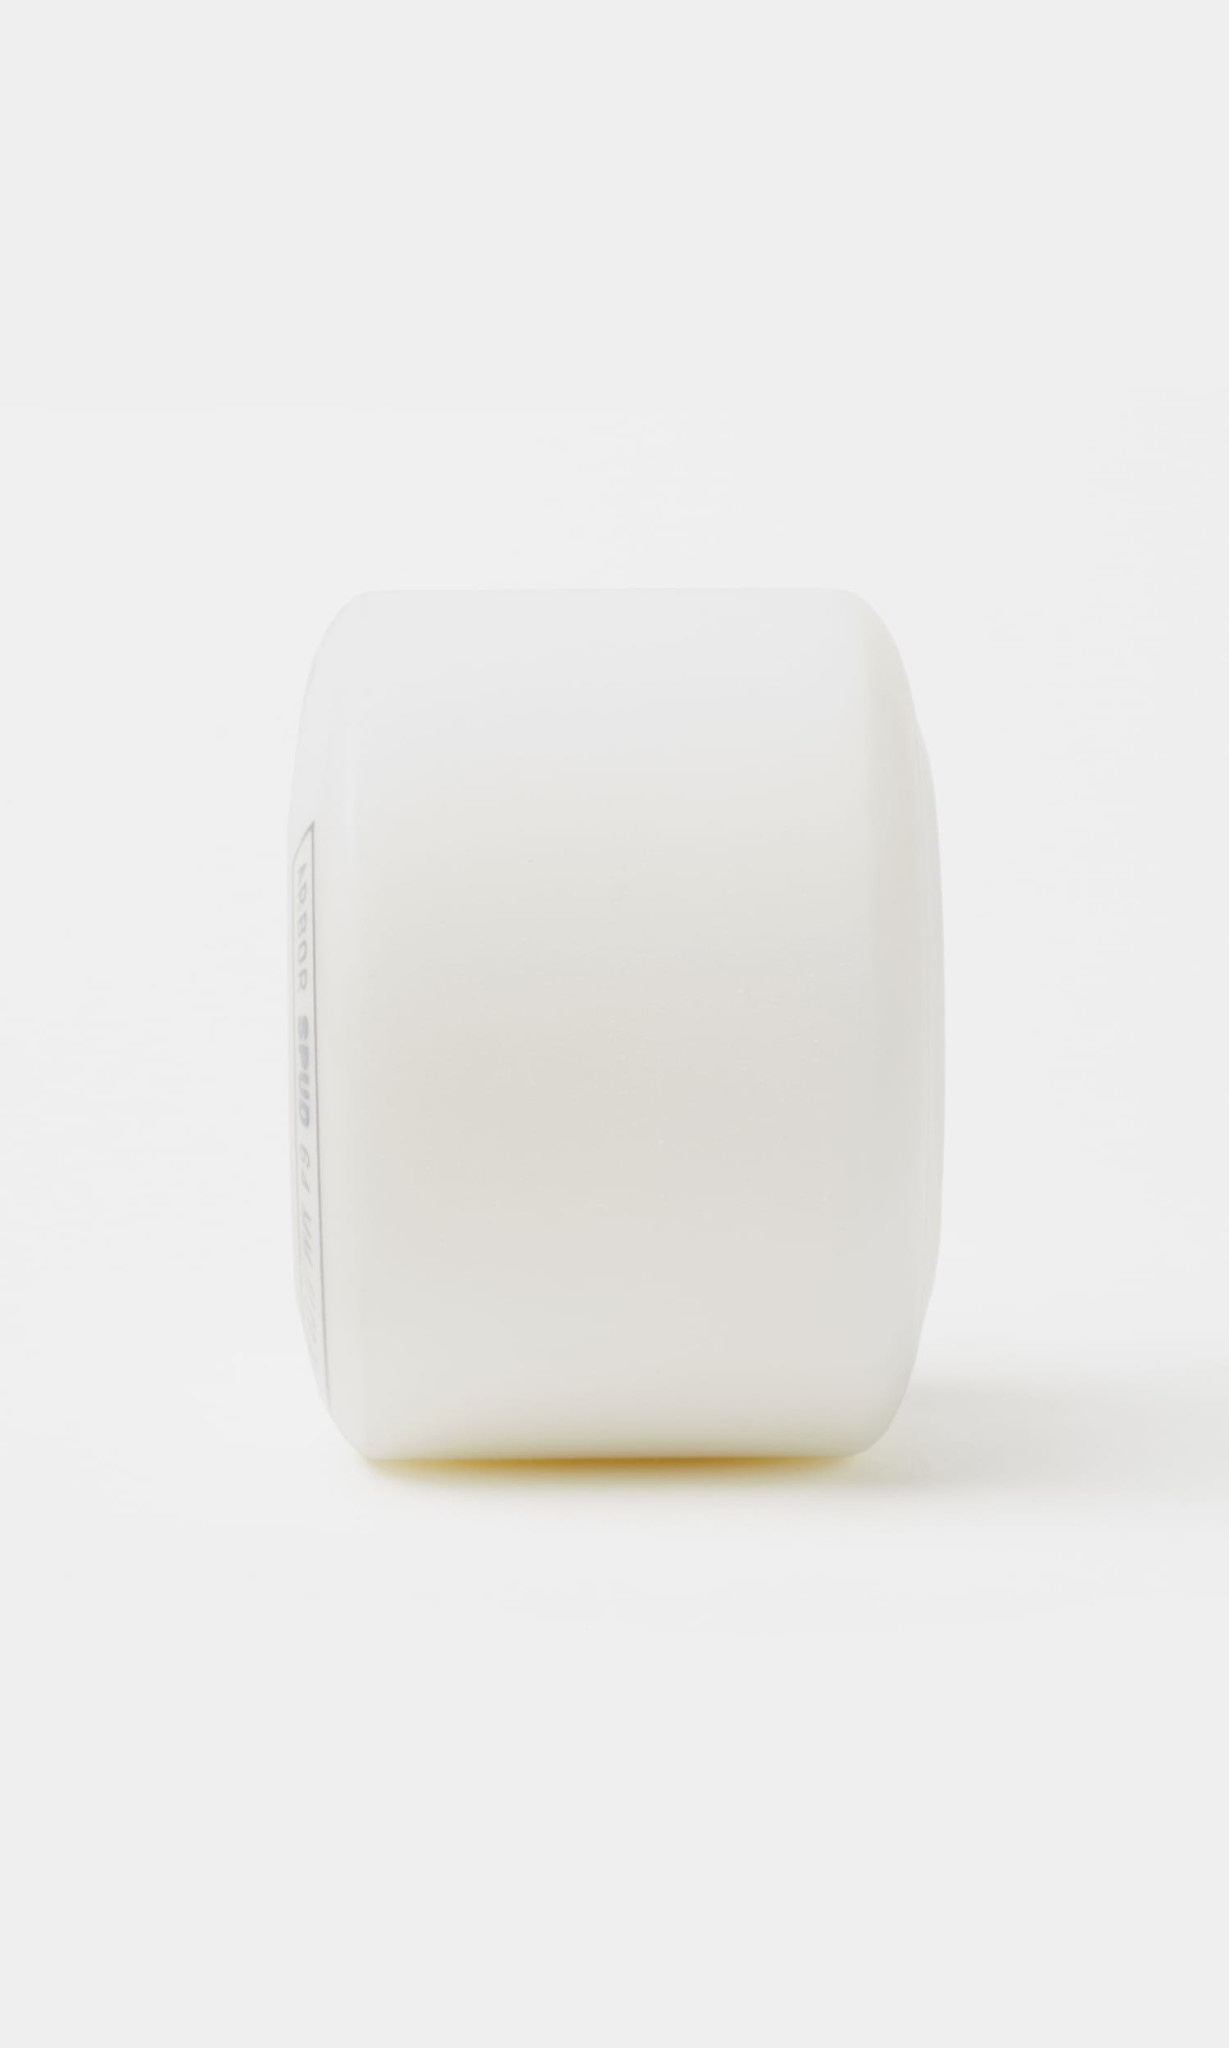 Arbor Spud Sucrose Initiative 82a White 64mm